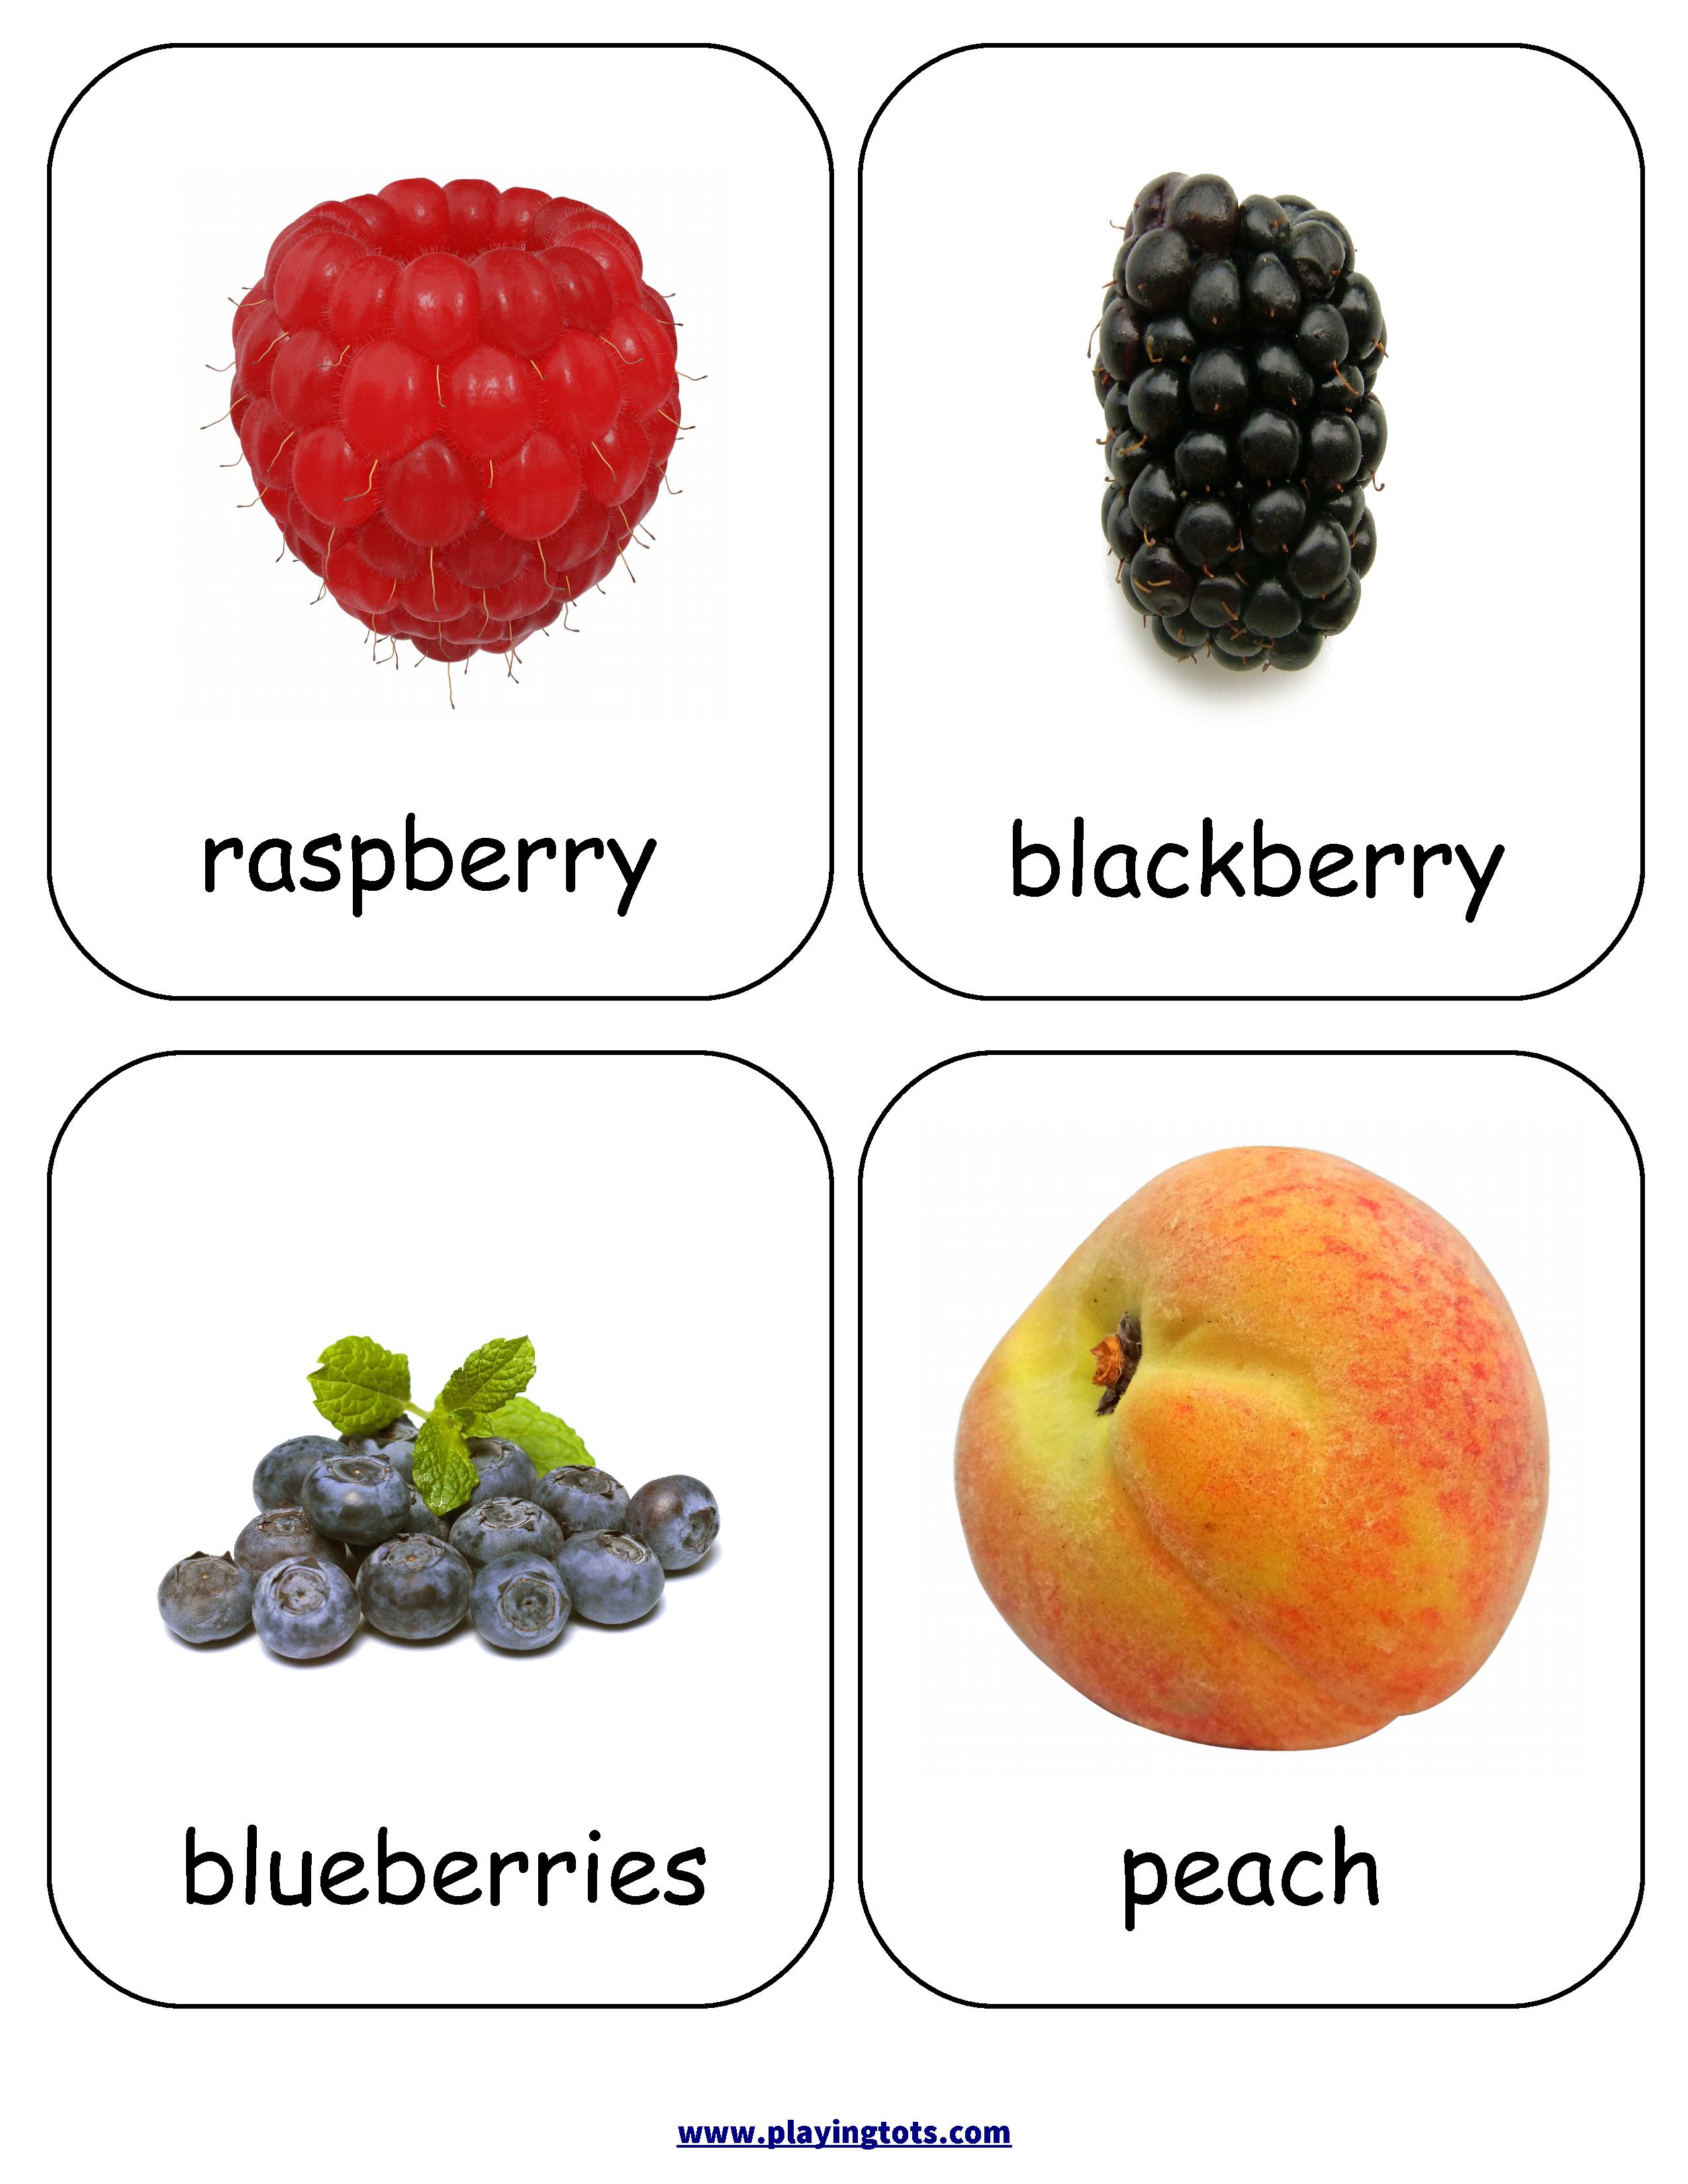 Free Printable For Kids Toddlers Preschoolers Flash Cards Charts Worksheets File Folder Atividades Sobre Alimentacao Saudavel Dia Da Alimentacao Atividades